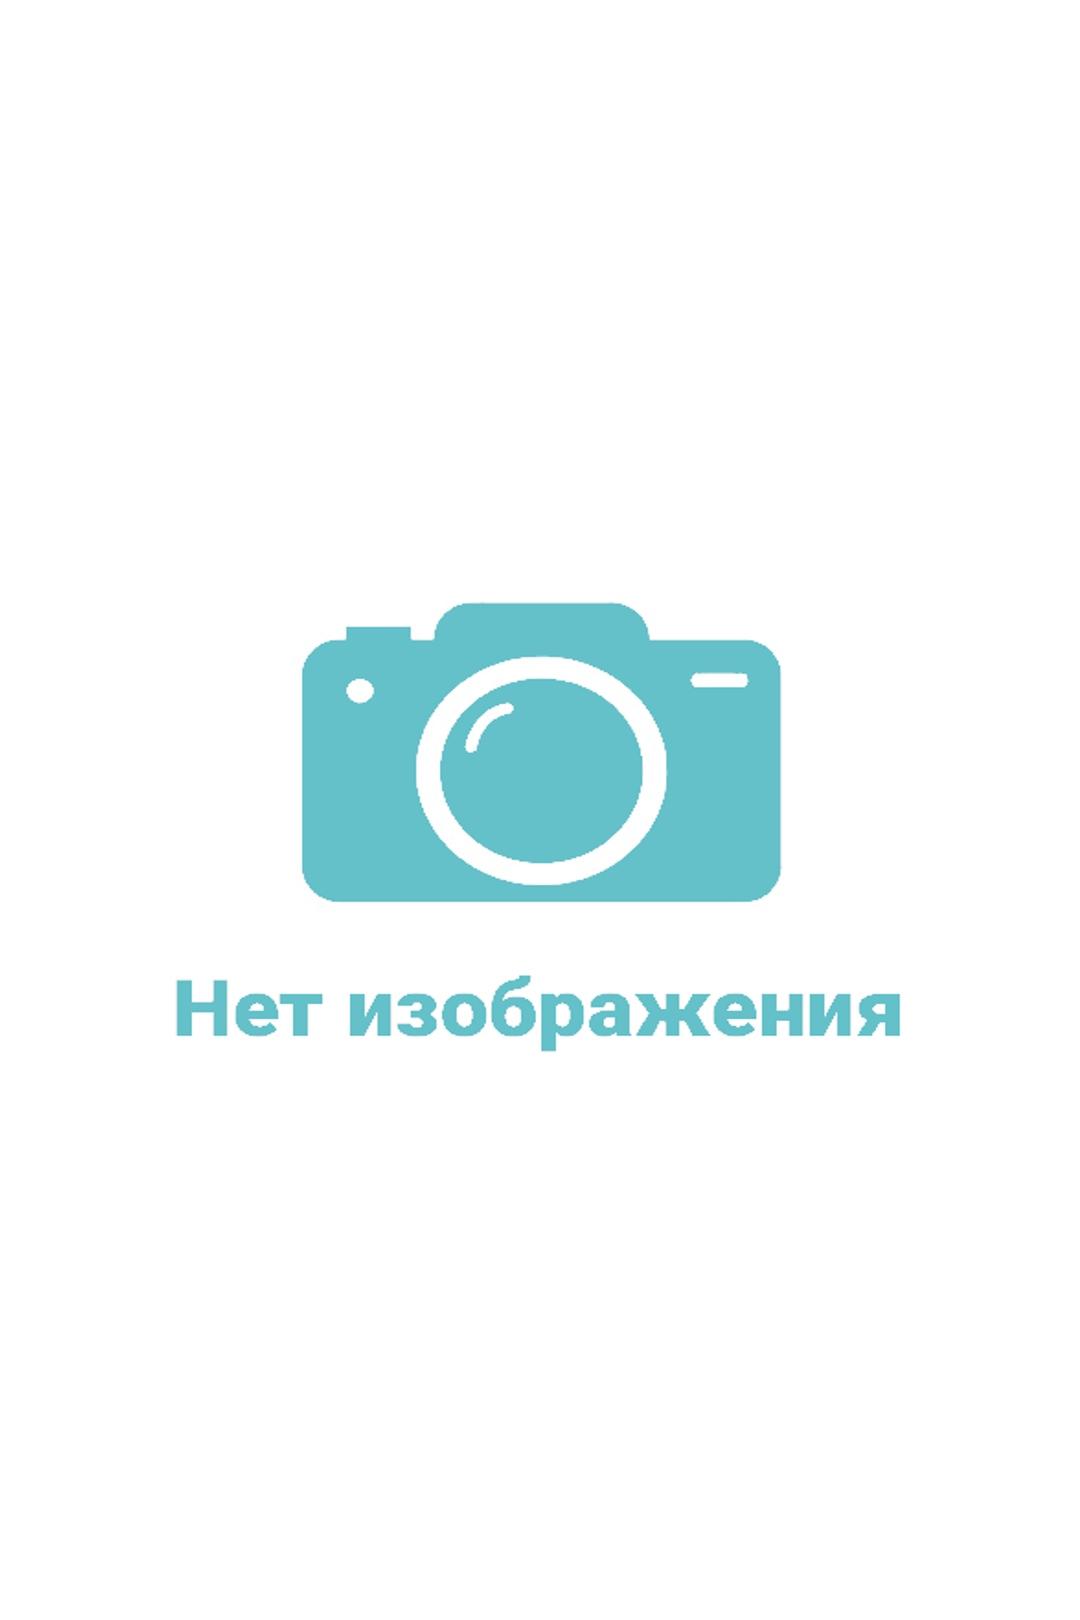 Врач онколог, химиотерапевт Ли Ярослав Андреевич